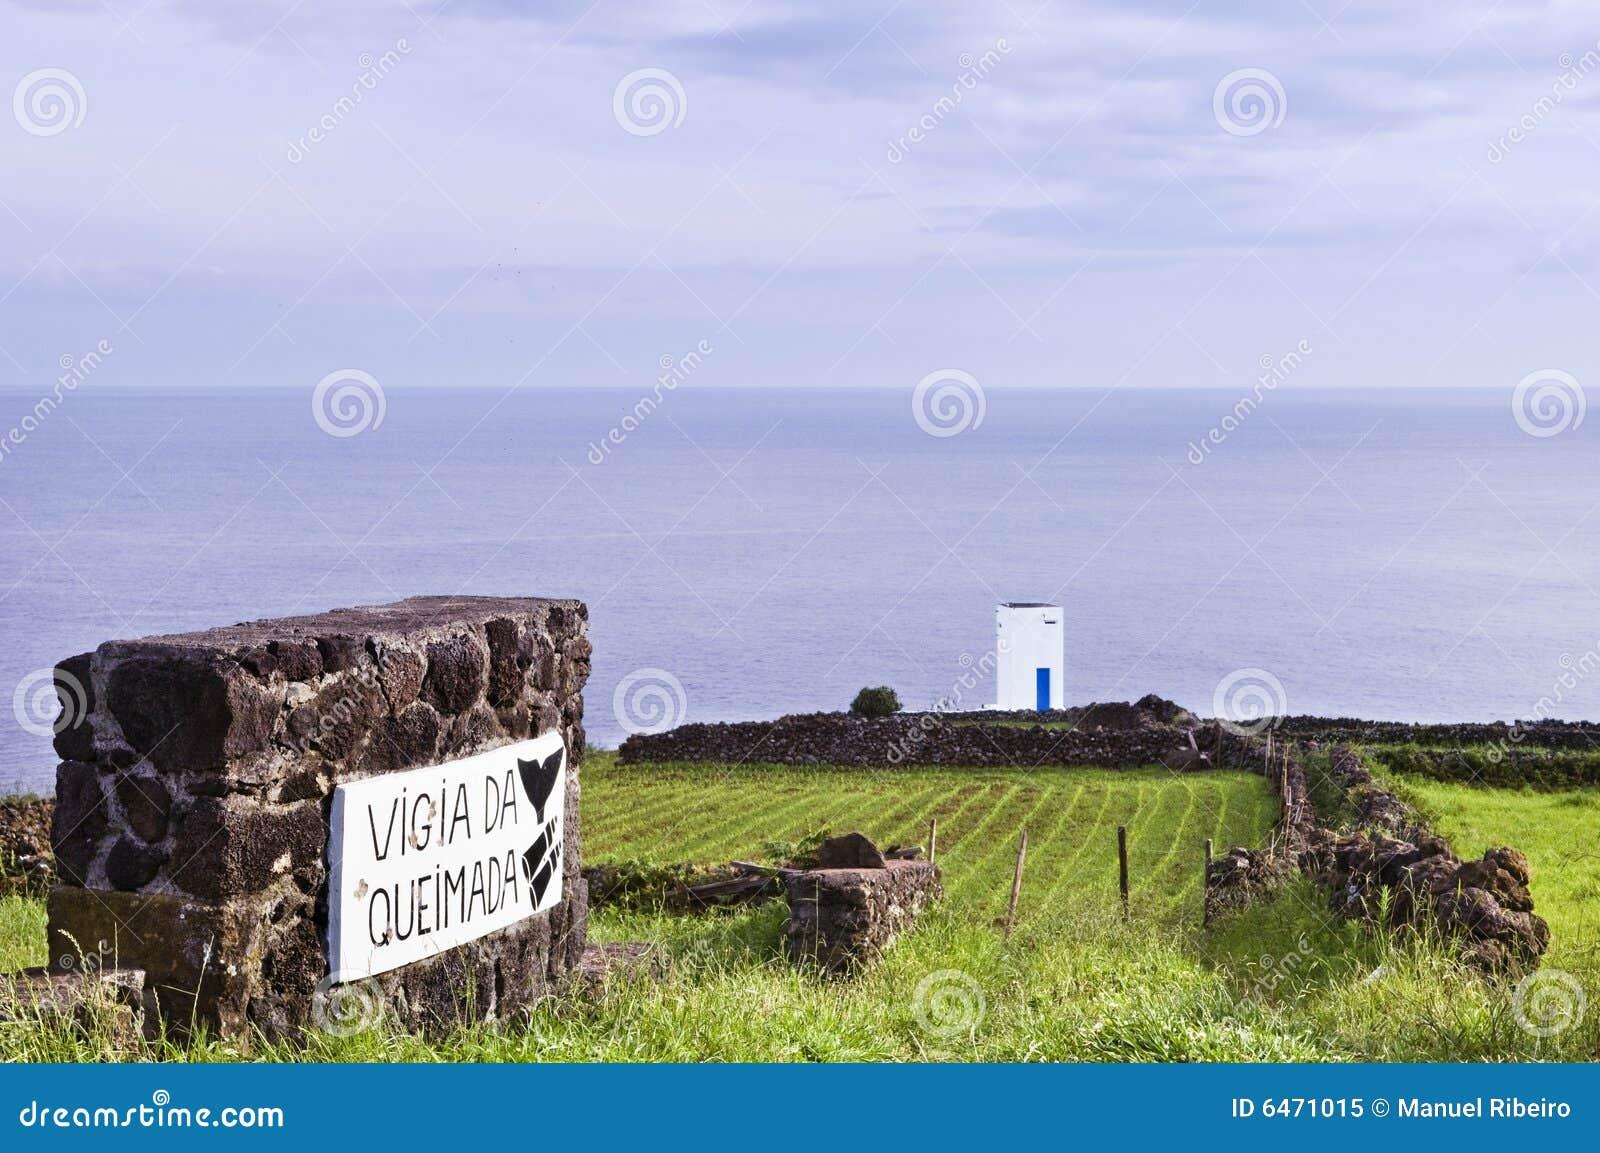 Waluhrkontrollturm in Pico, Azoren